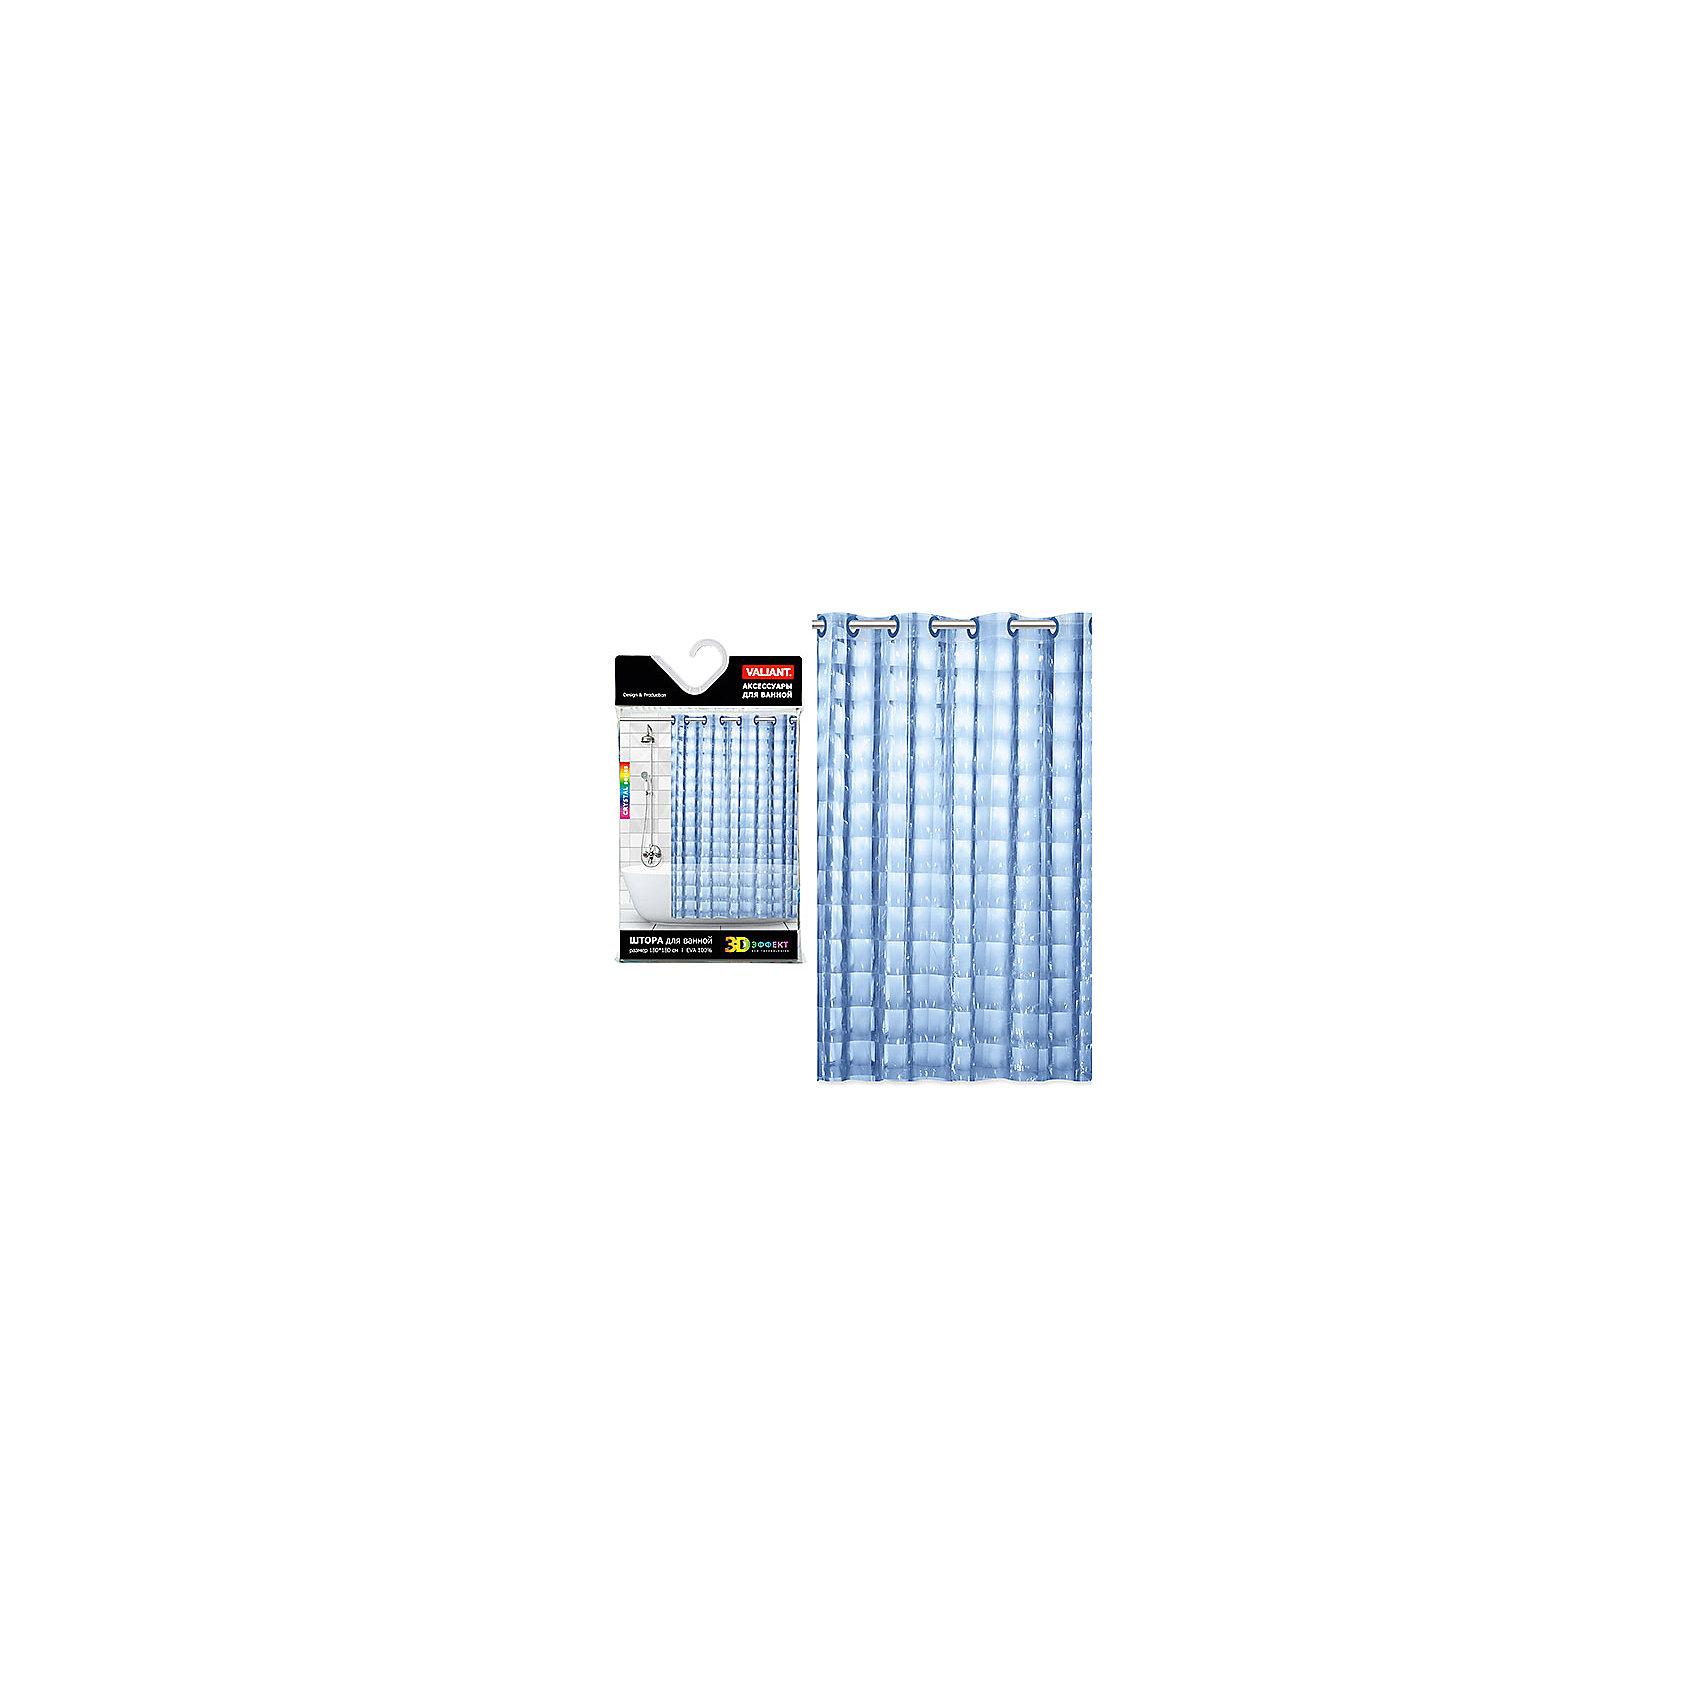 VALIANT Штора для ванной, EVA, 180*180 см, CUBE MIRROR, Valiant